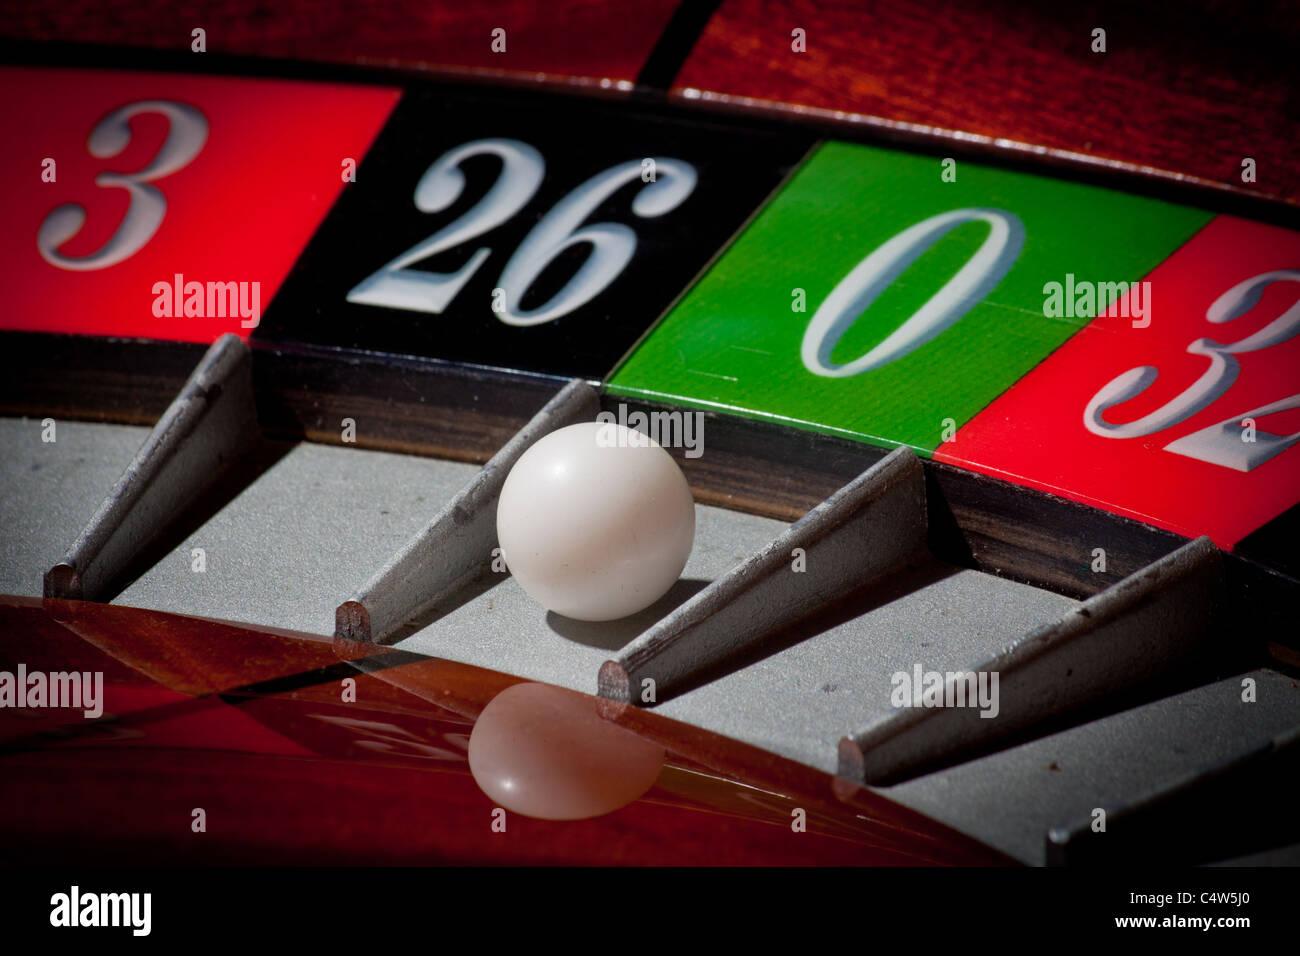 European casino roulette wheel zero loser 0 - Stock Image